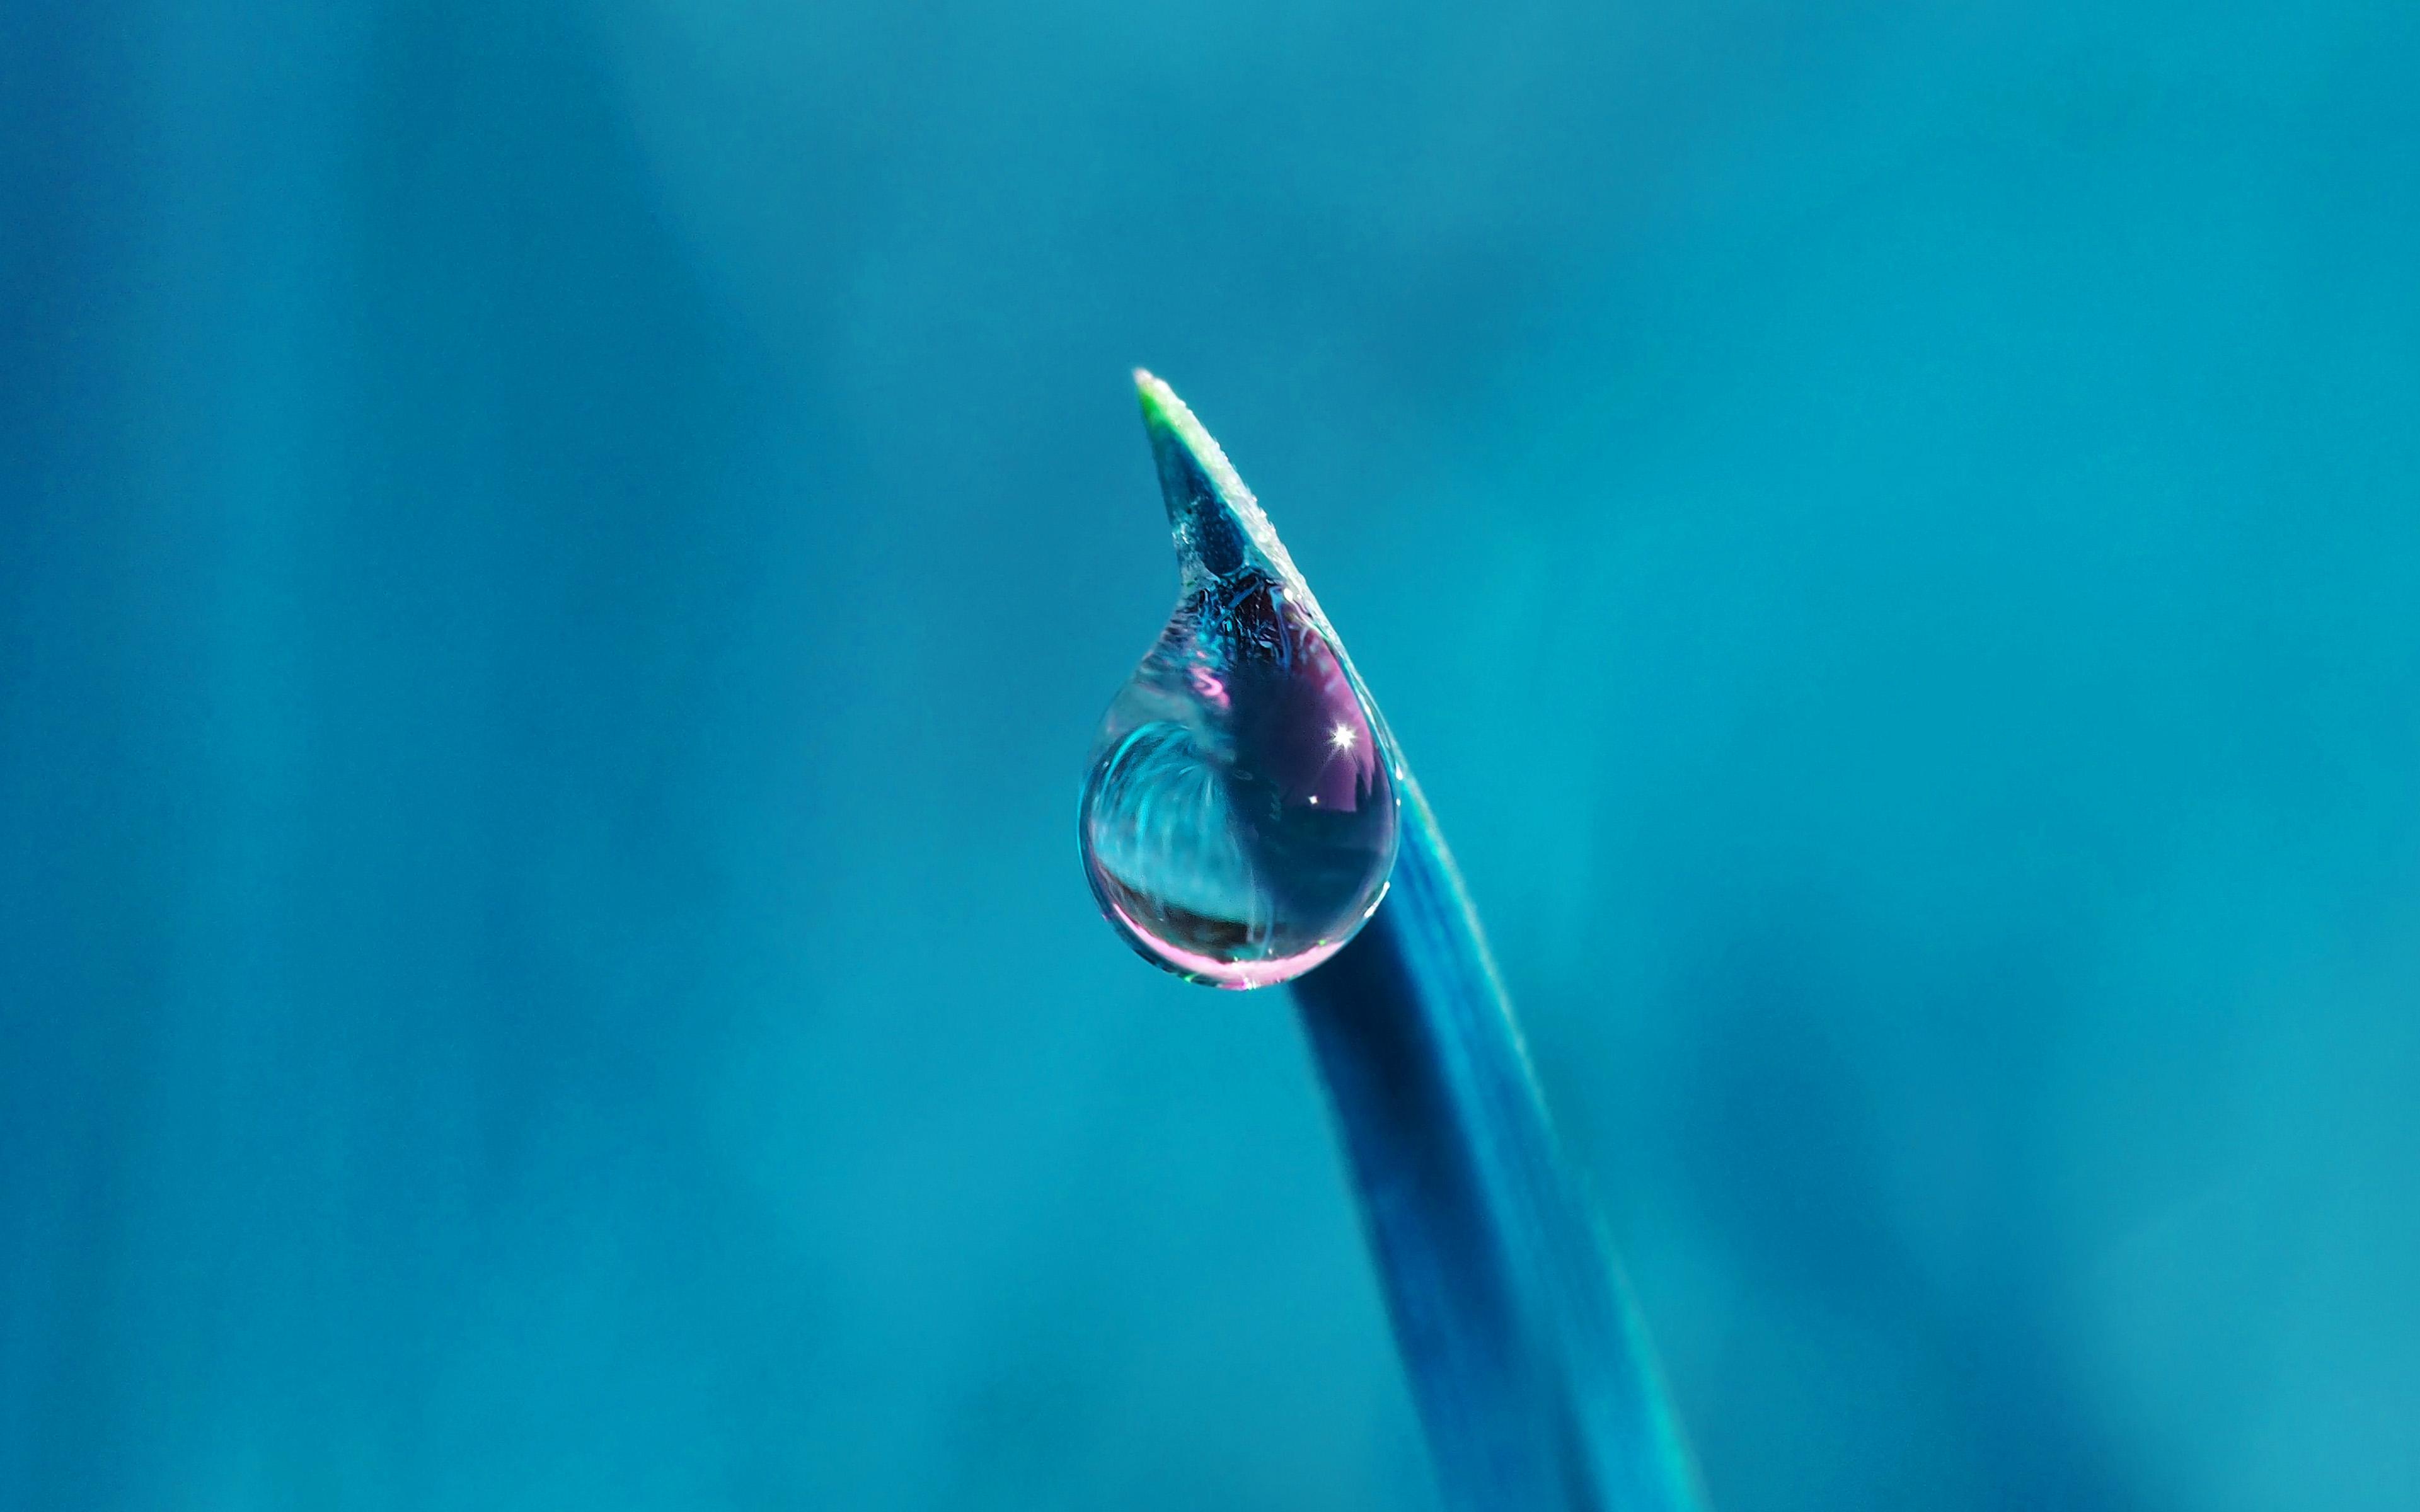 Papers Co Desktop Wallpaper Nk29 Water Drip Rain Blue